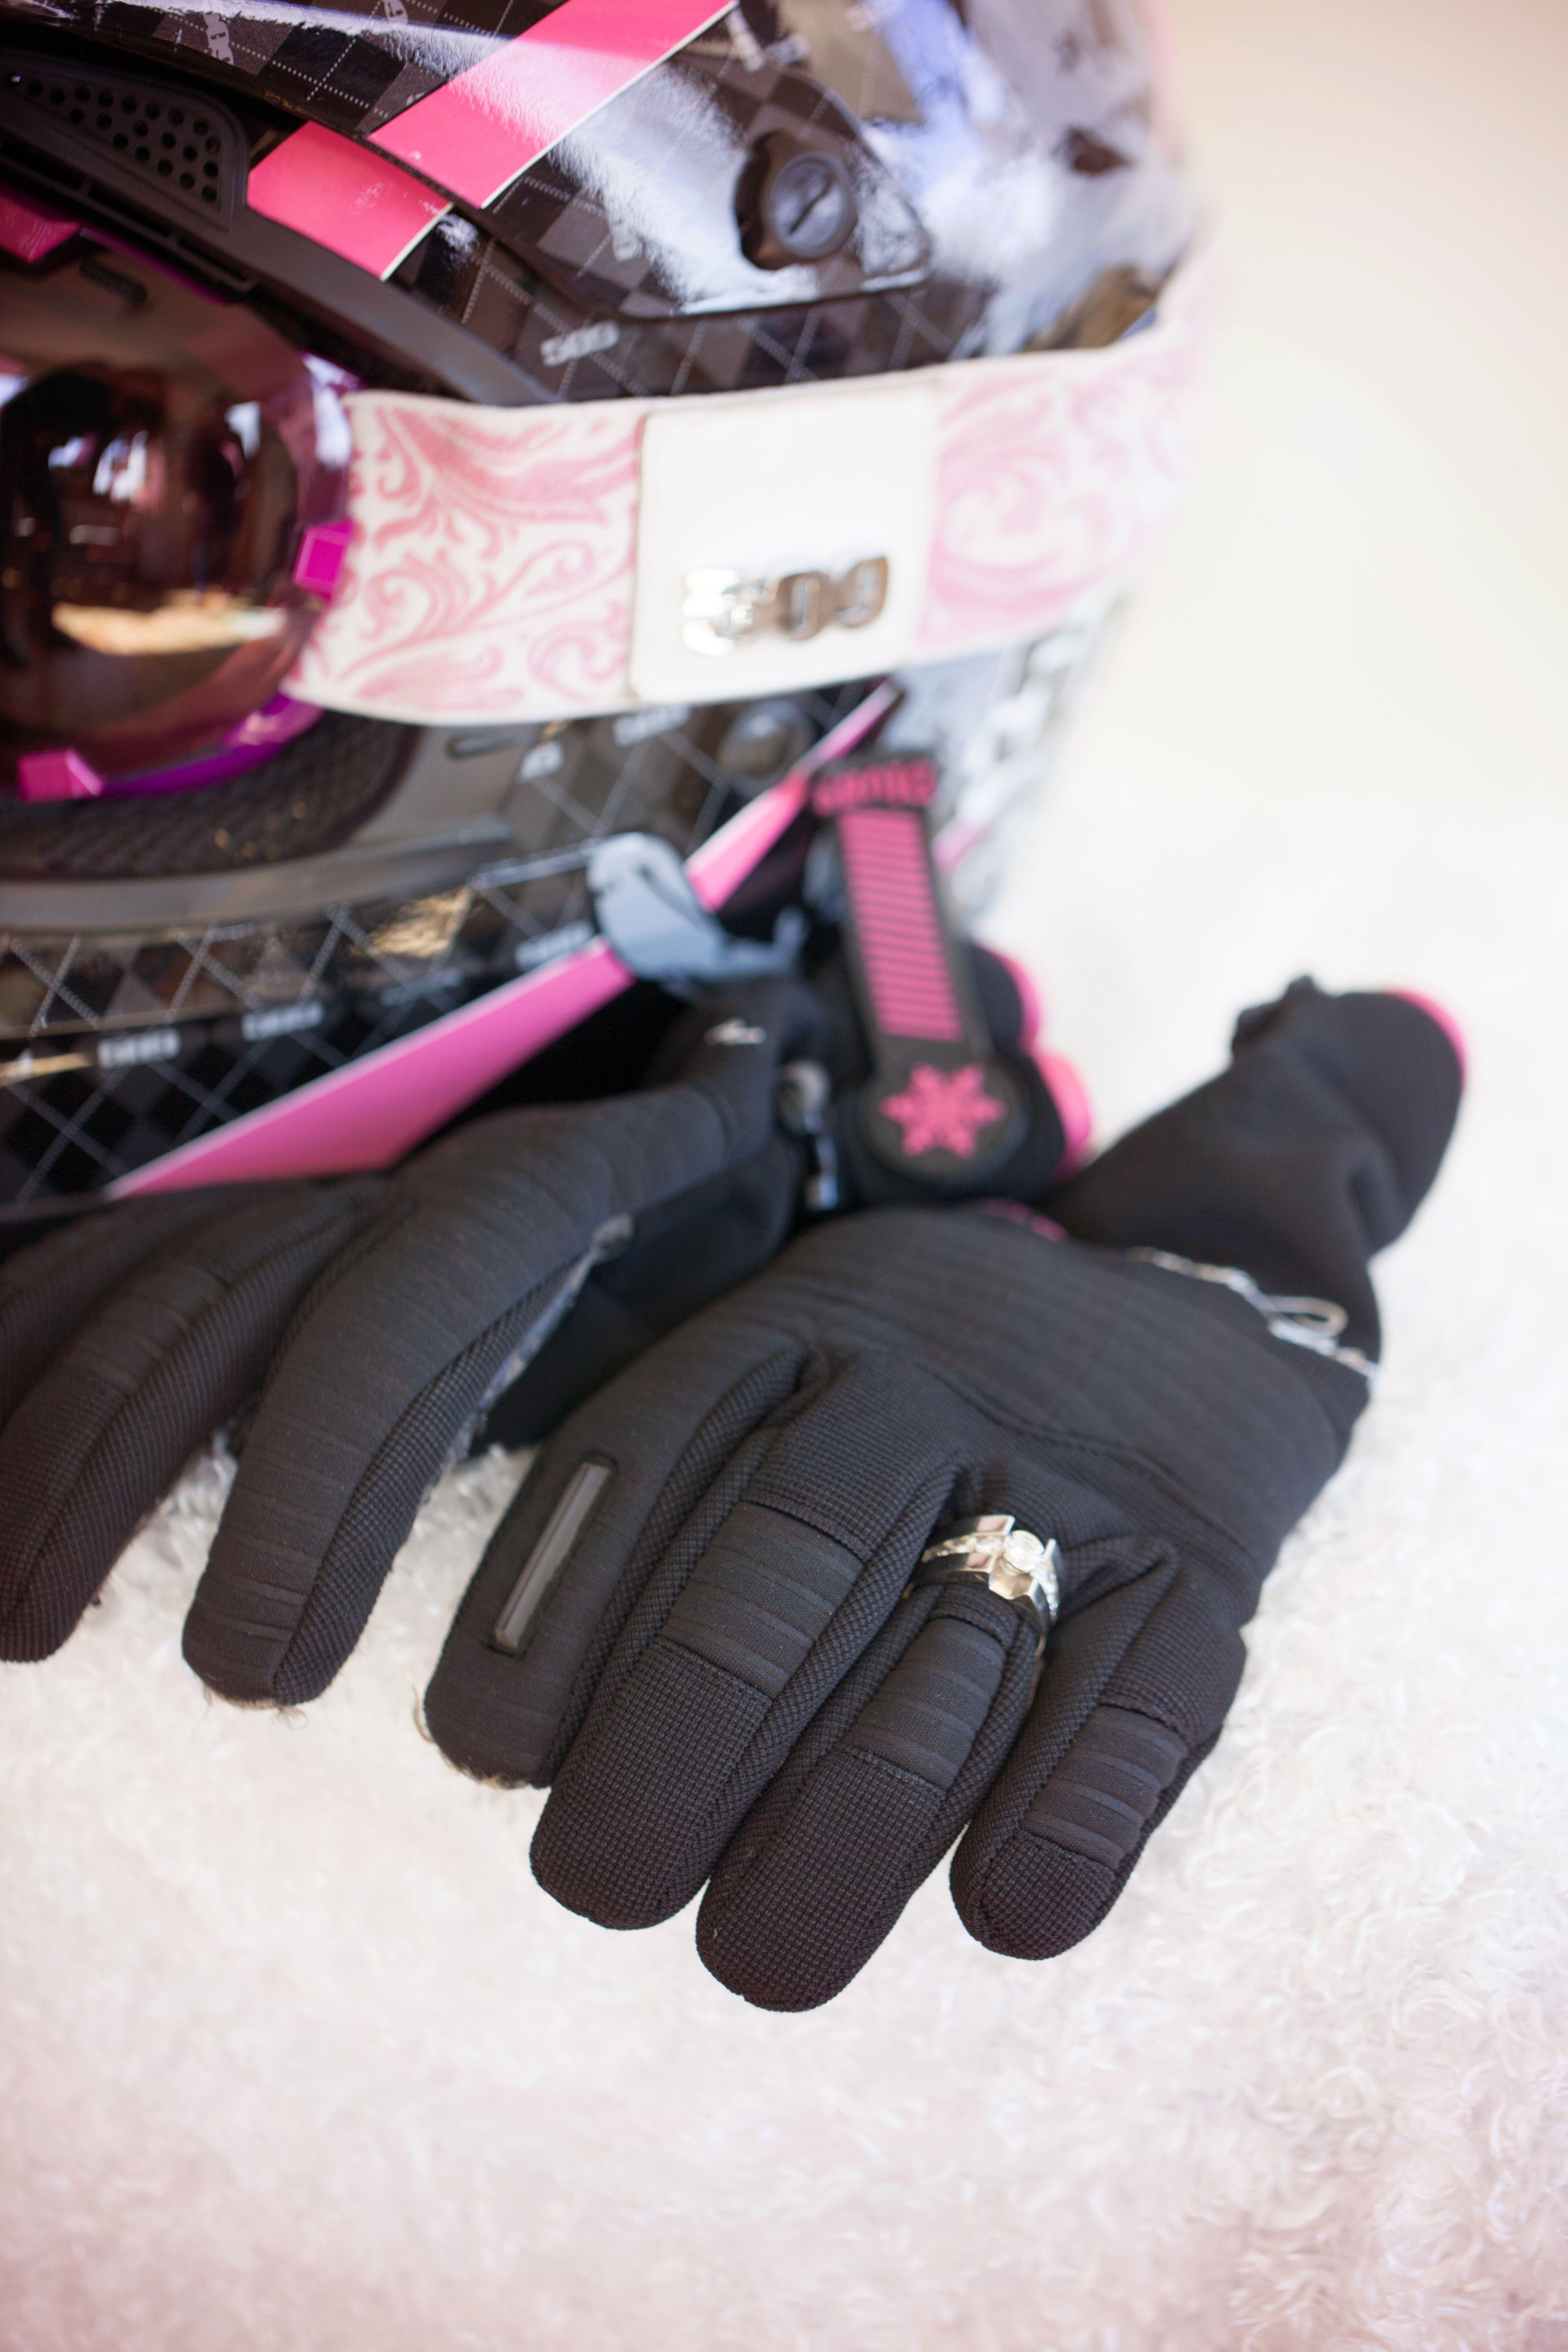 snowmobile, engagement picture, winter wedding #DivasSnowGear, #509